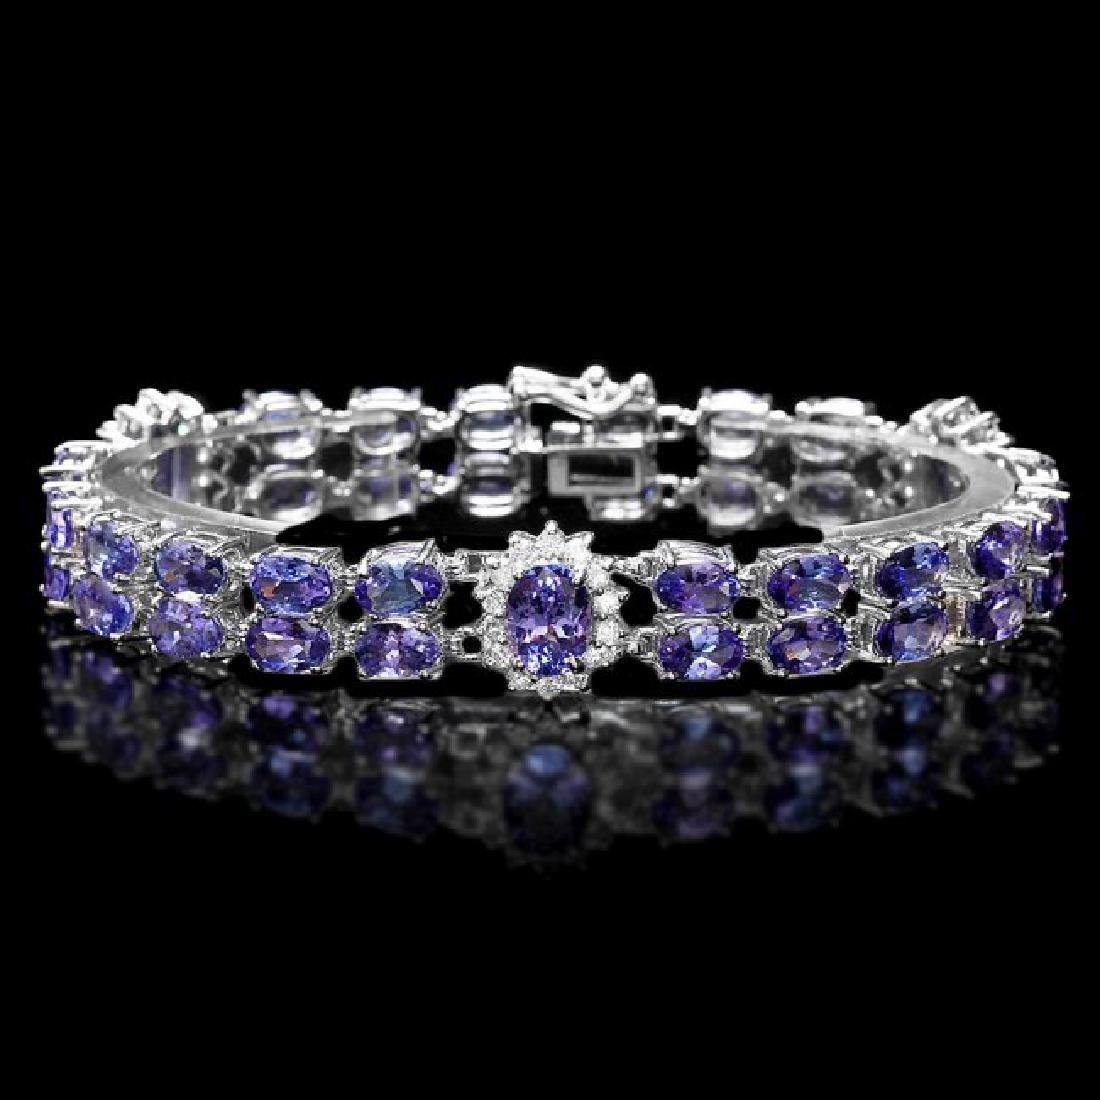 14k W Gold 20ct Tanzanite 1.35ct Diamond Bracelet